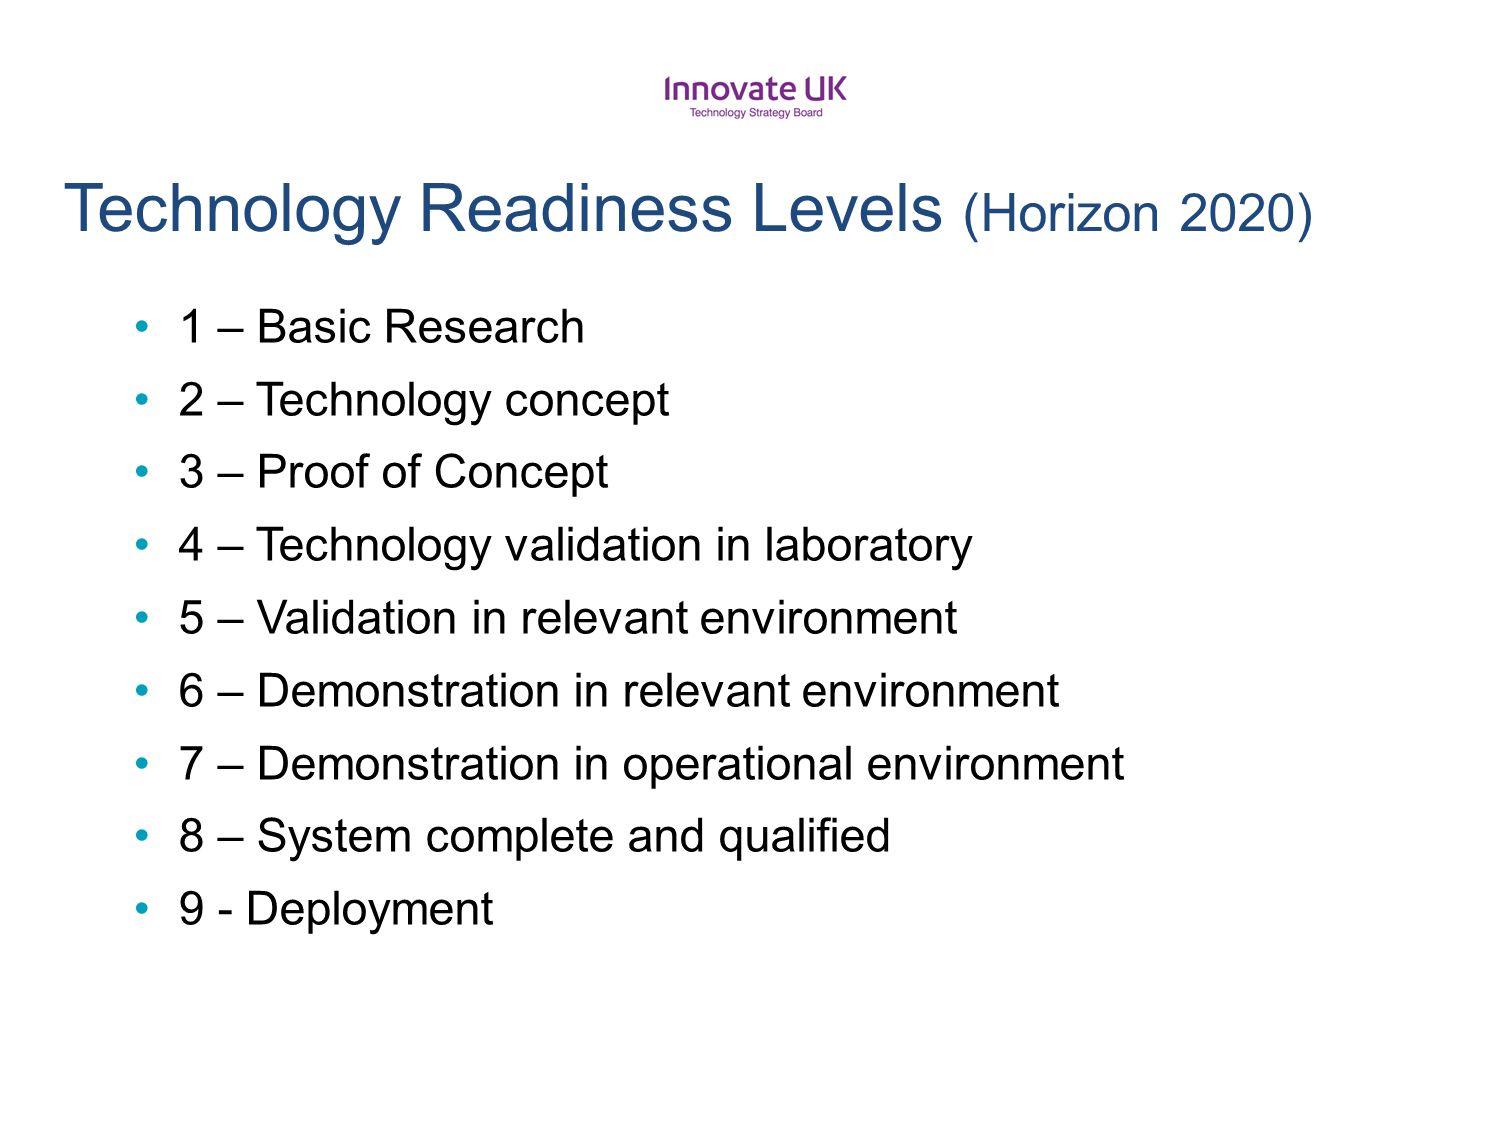 Technology Readiness Levels (Horizon 2020)